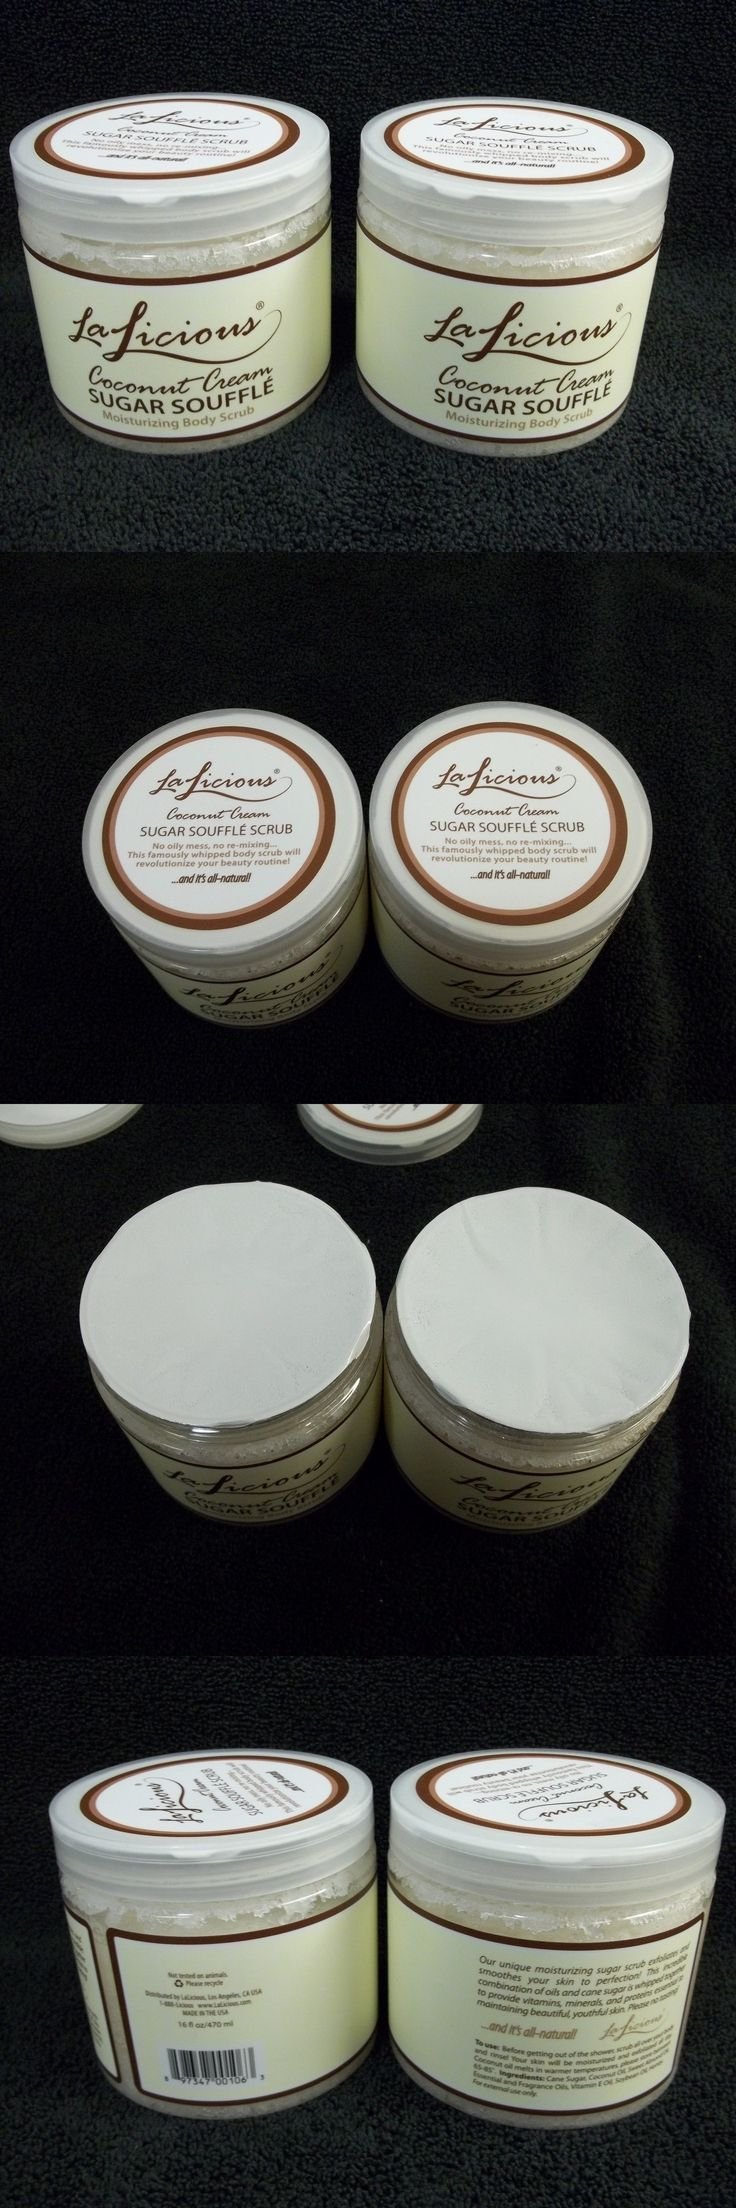 Body Scrubs and Exfoliants: New Lalicious Coconut Cream Sugar Souffle Moisturizing Body Scrub Two 16 Oz Jars -> BUY IT NOW ONLY: $58.88 on eBay!